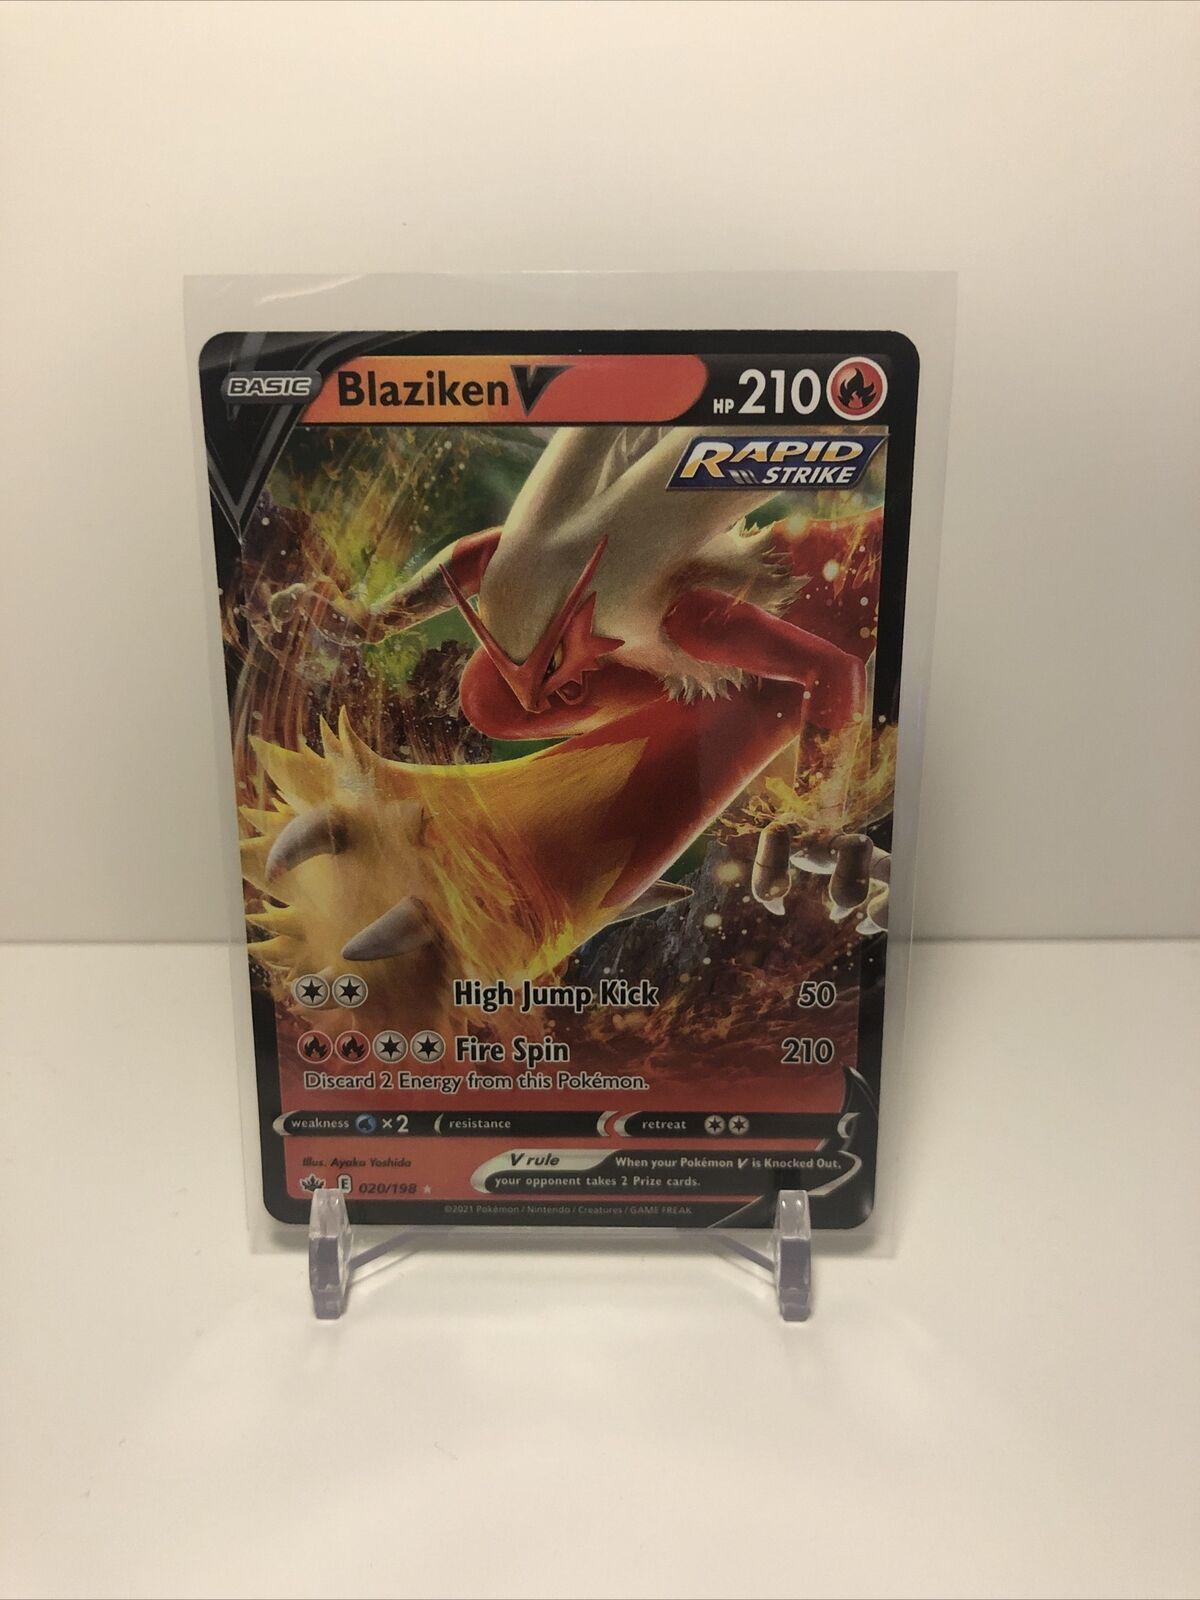 Blaziken V Pokémon Card (Chilling Reign 020/198) Ultra Rare